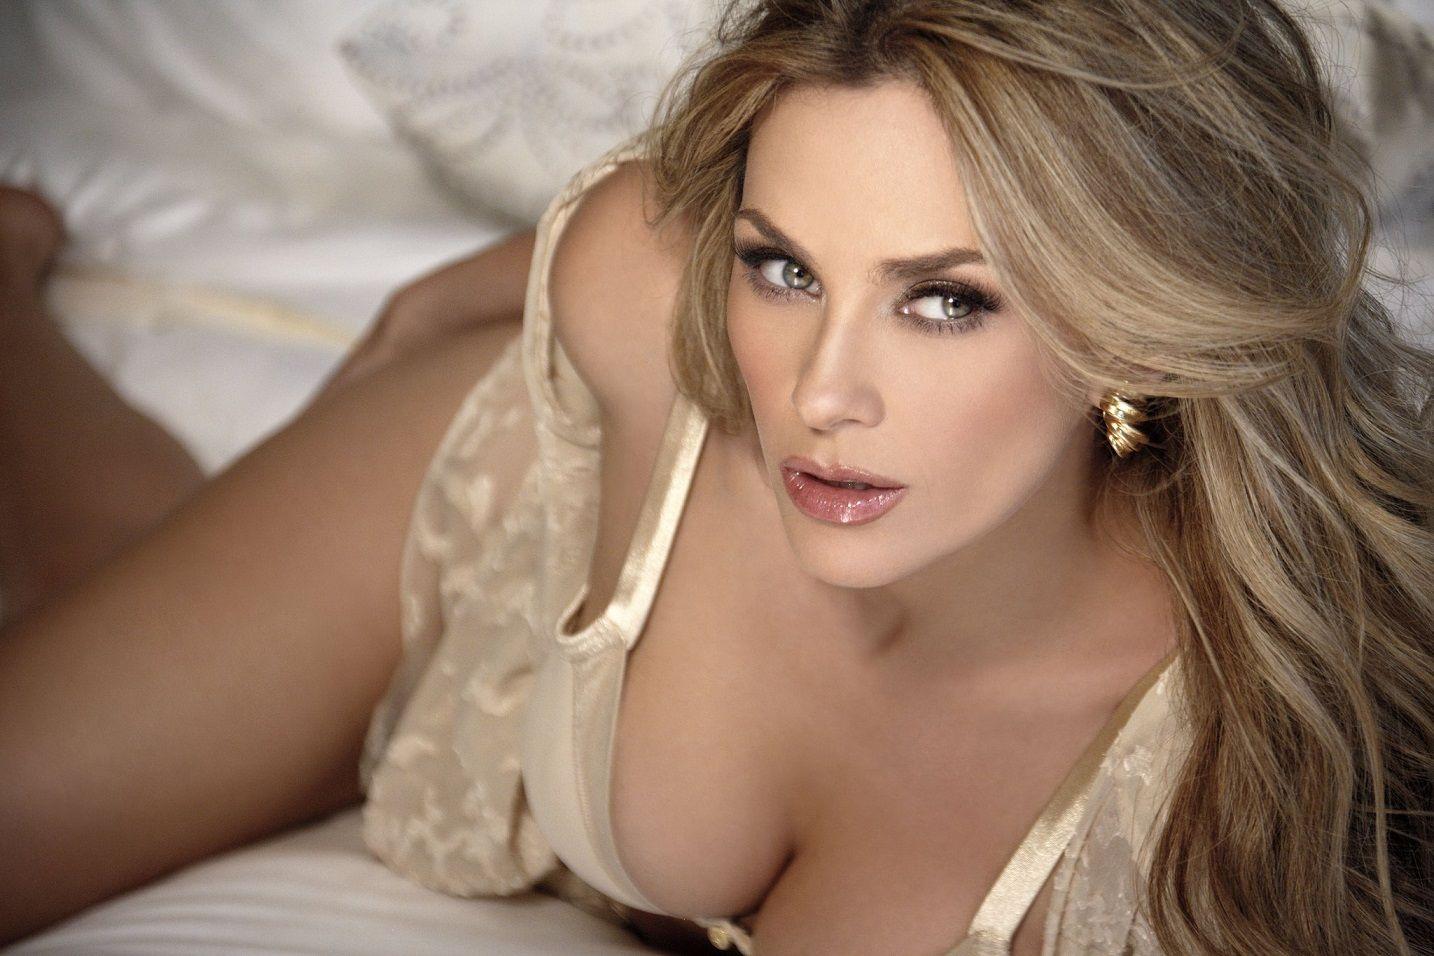 Huge tits blonde anal sex